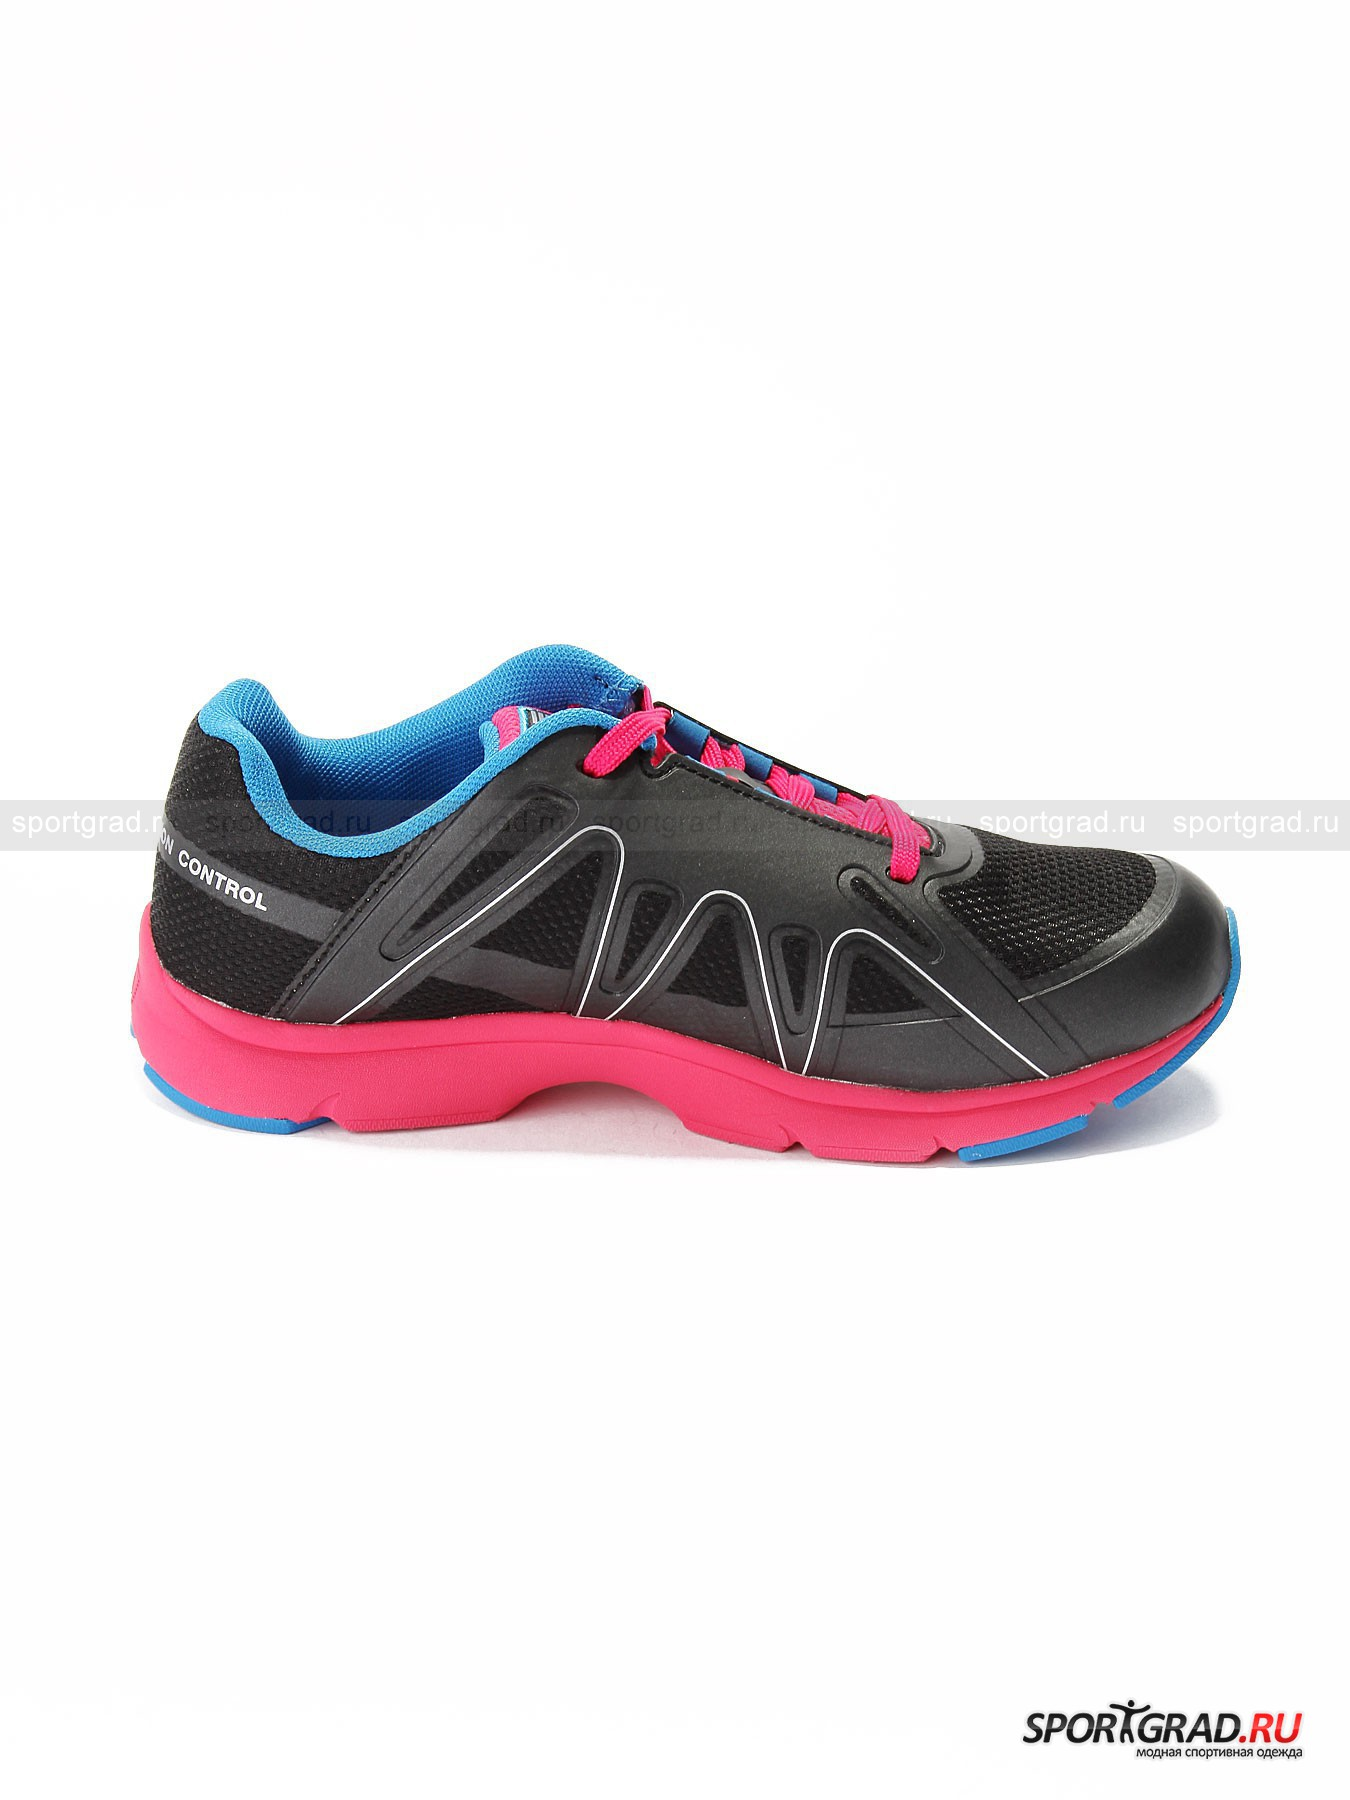 Кроссовки женские  C-cube New Vigor W Shoes EA7 EMPORIO ARMANI от Спортград